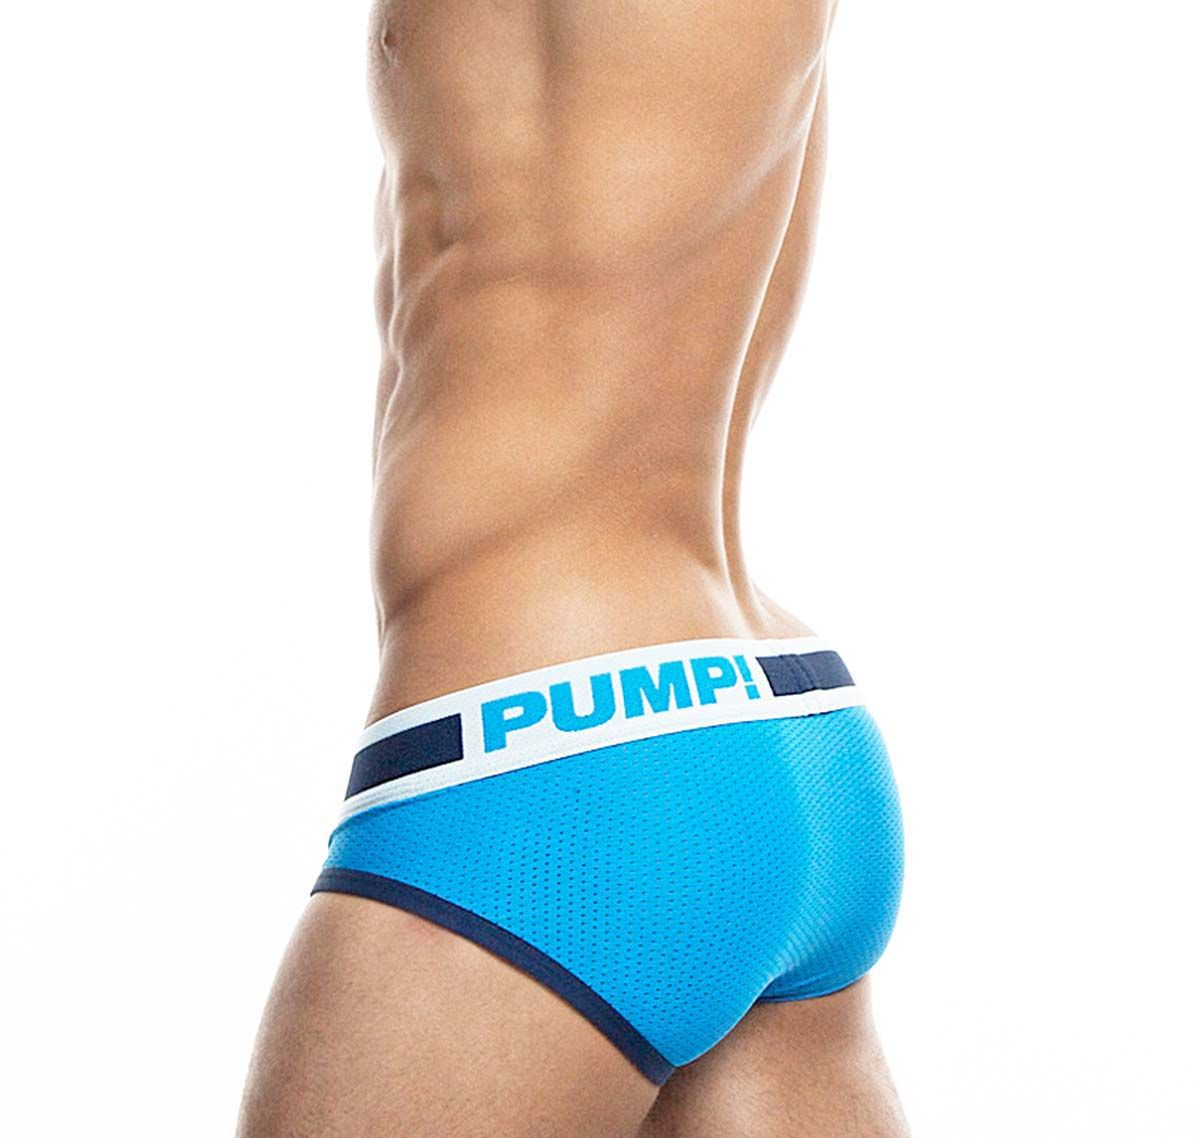 Pump! Slip TRUE BLUE BRIEF 12031, blau